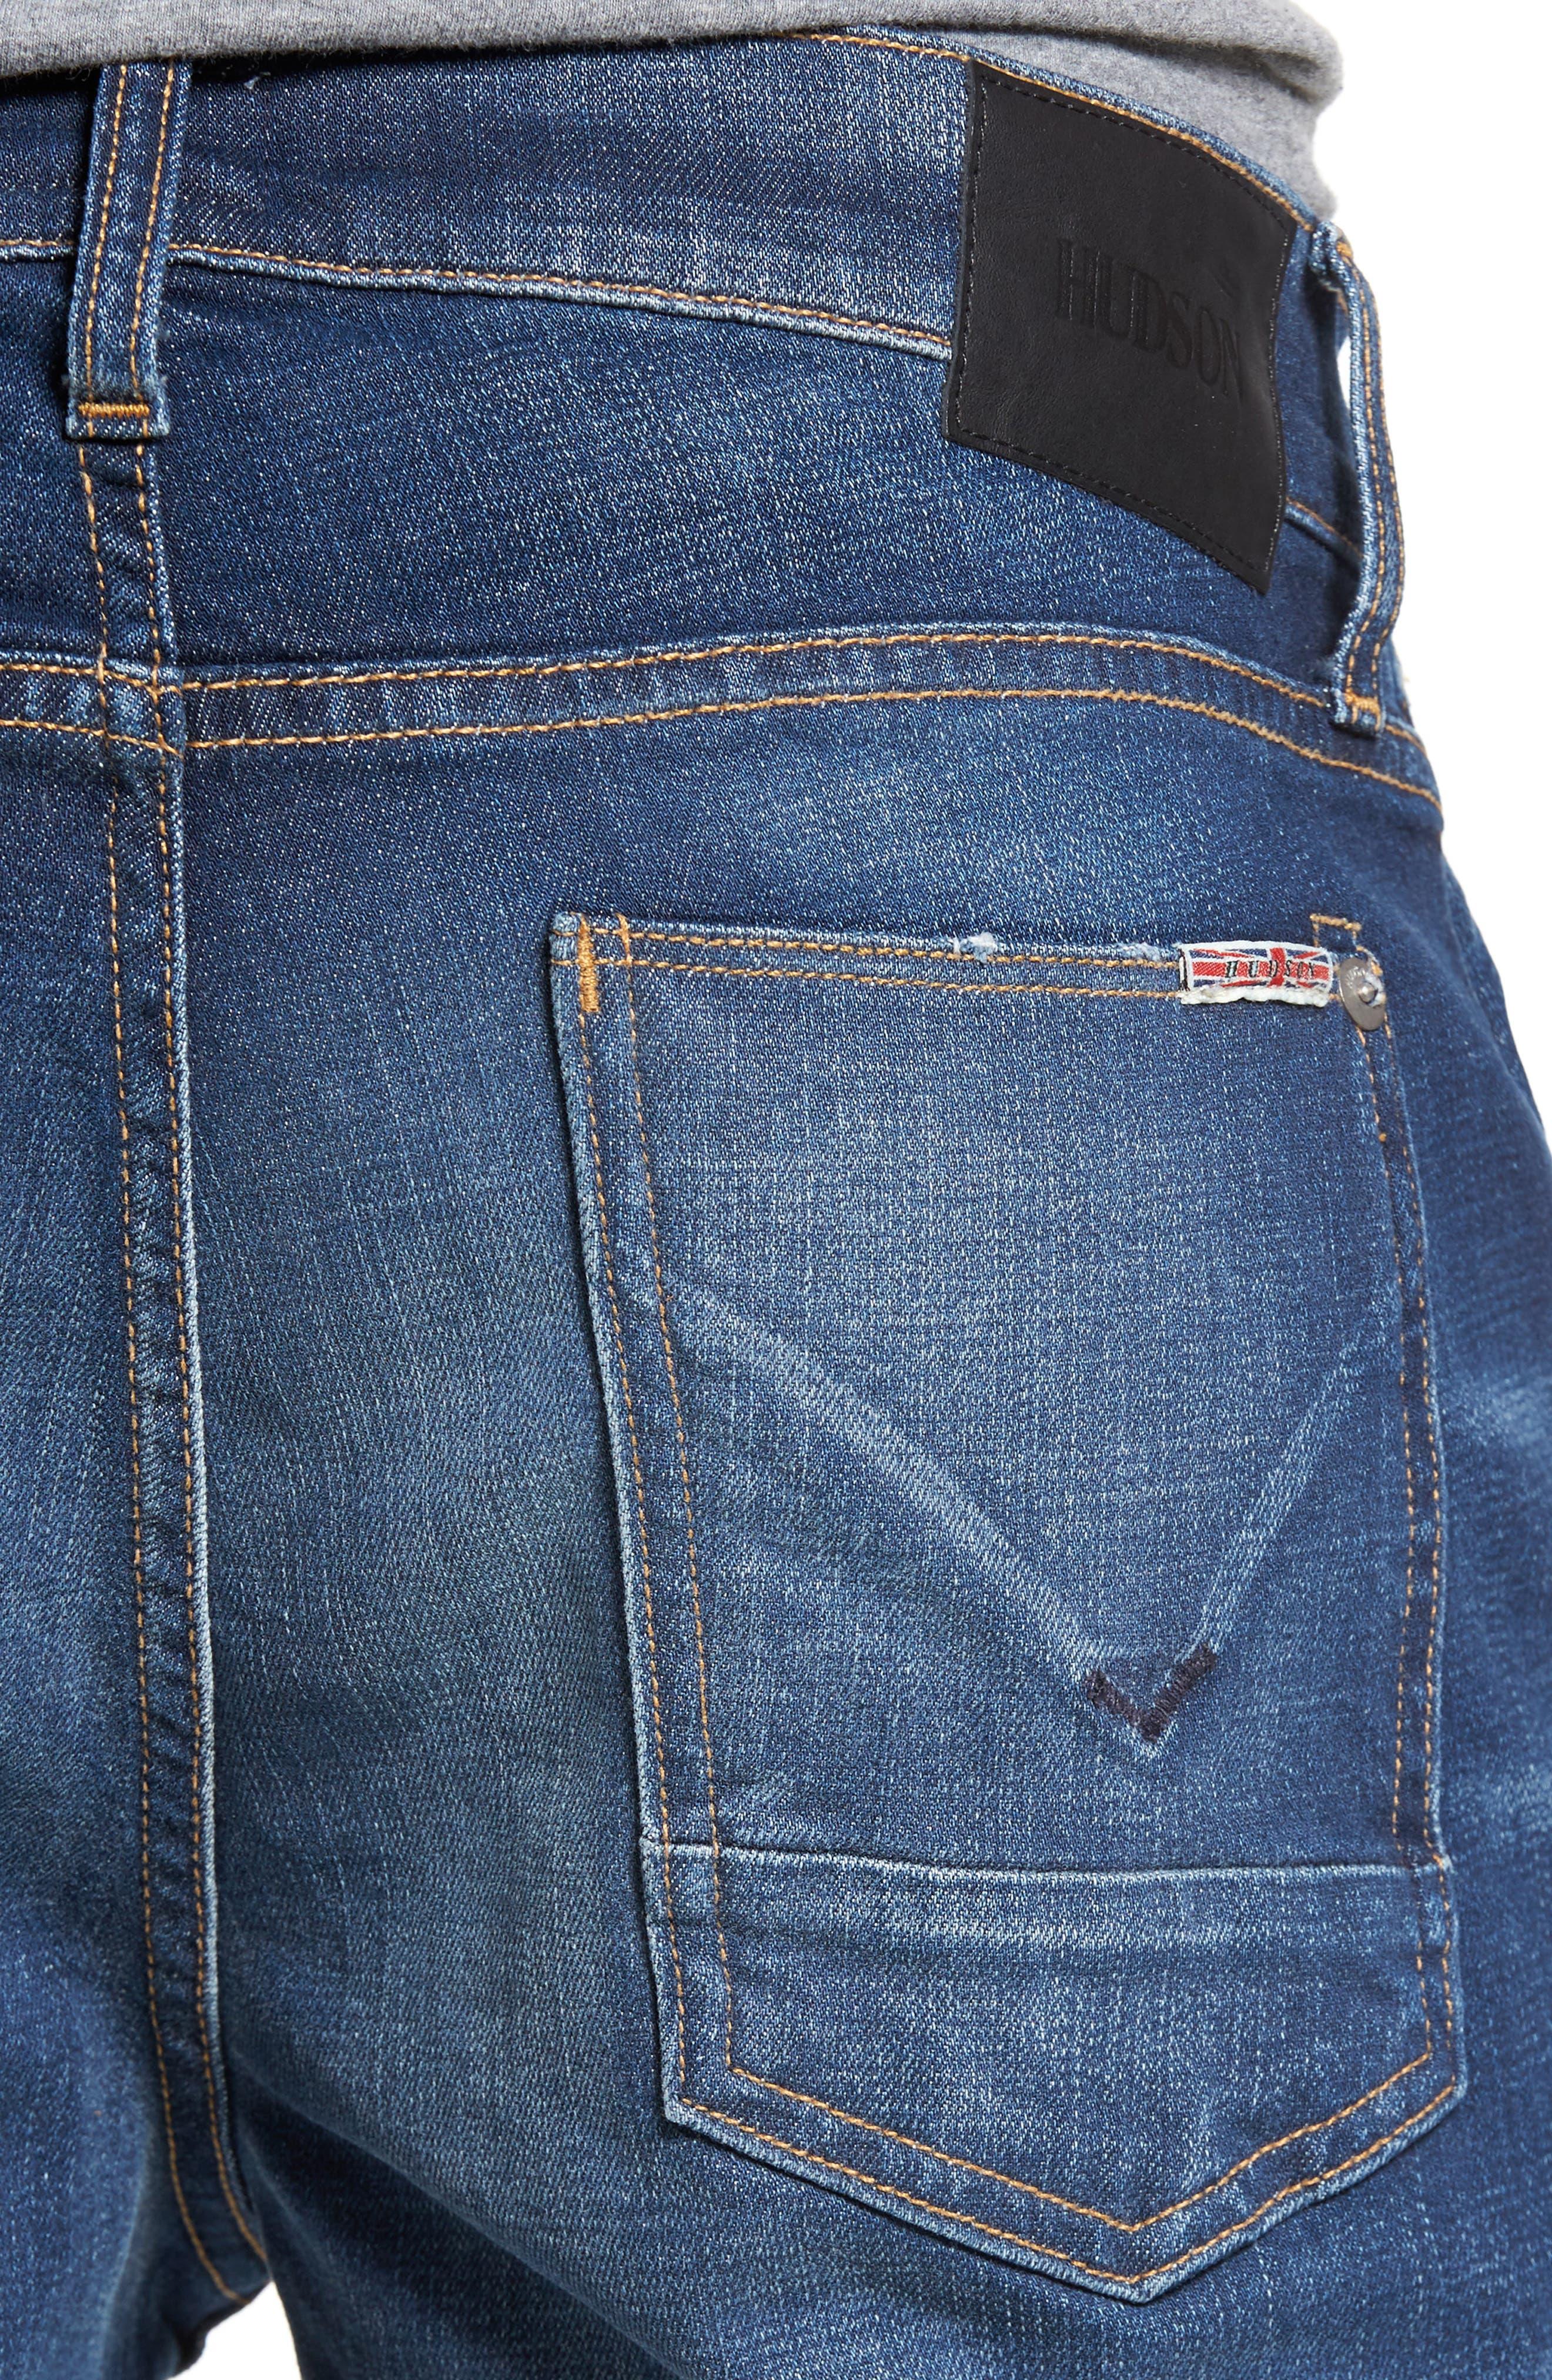 Blake Slim Fit Jeans,                             Alternate thumbnail 4, color,                             Genuine